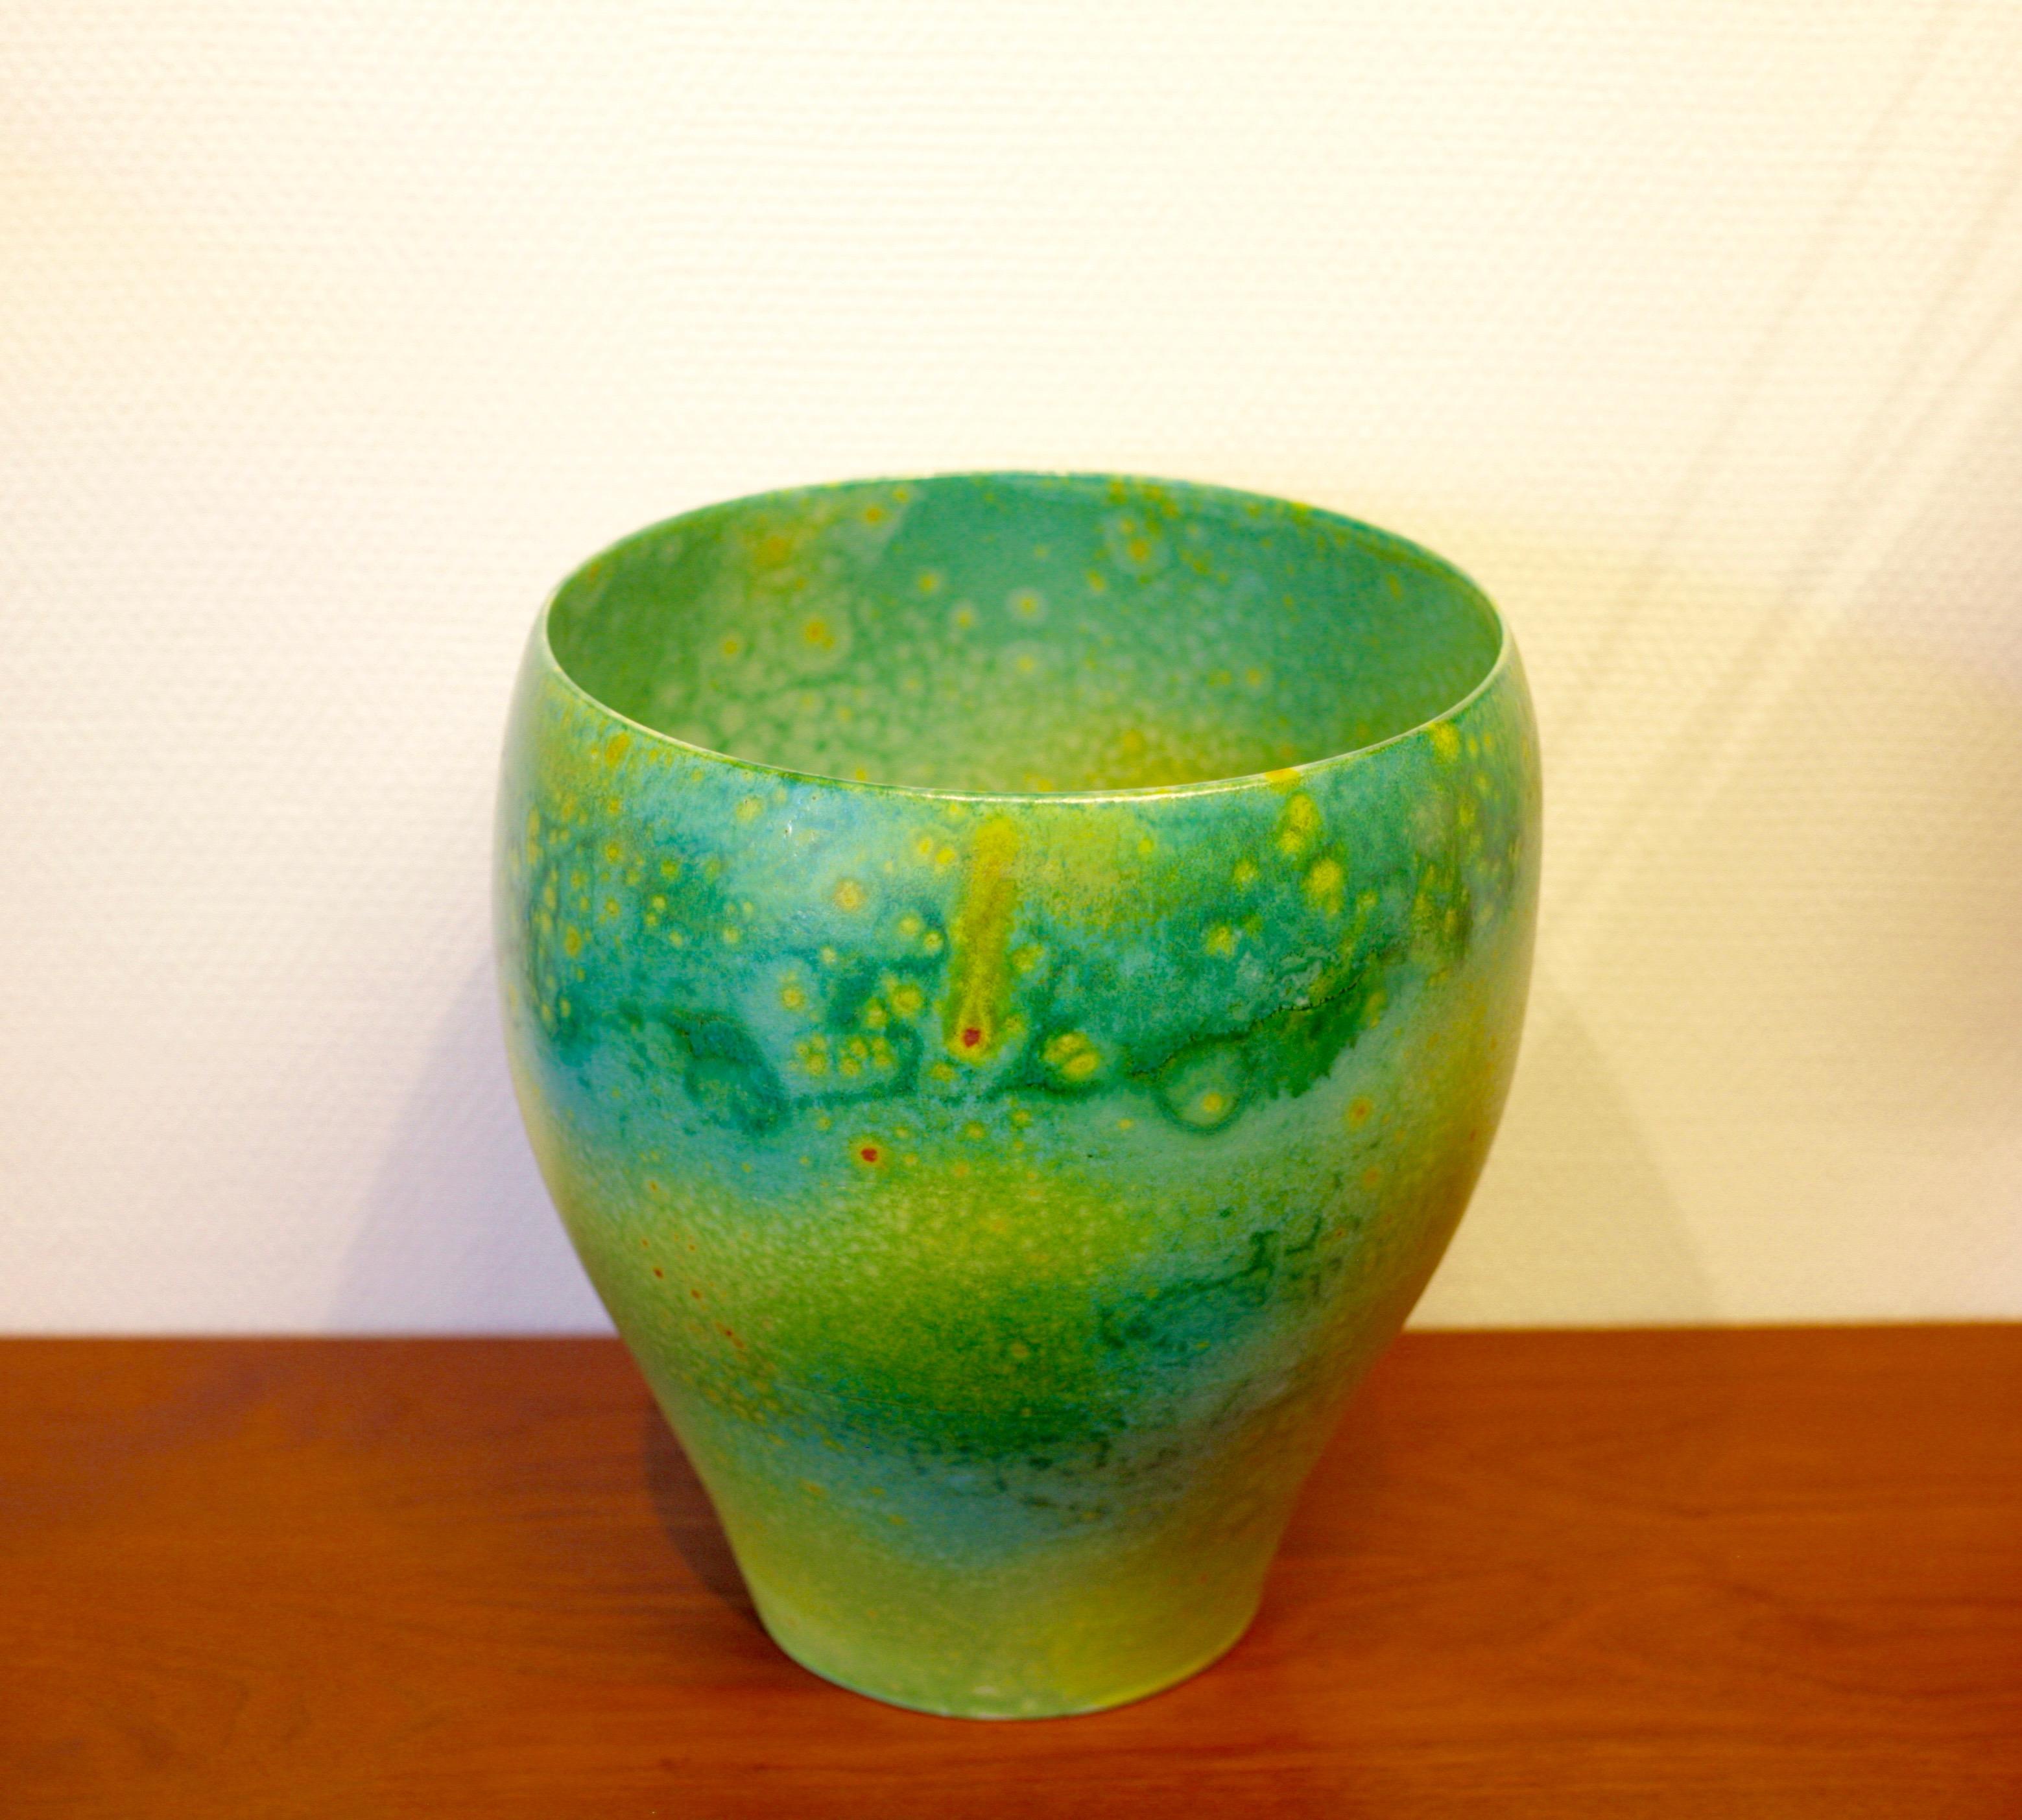 Large porcelain bowl by Per Hammarström